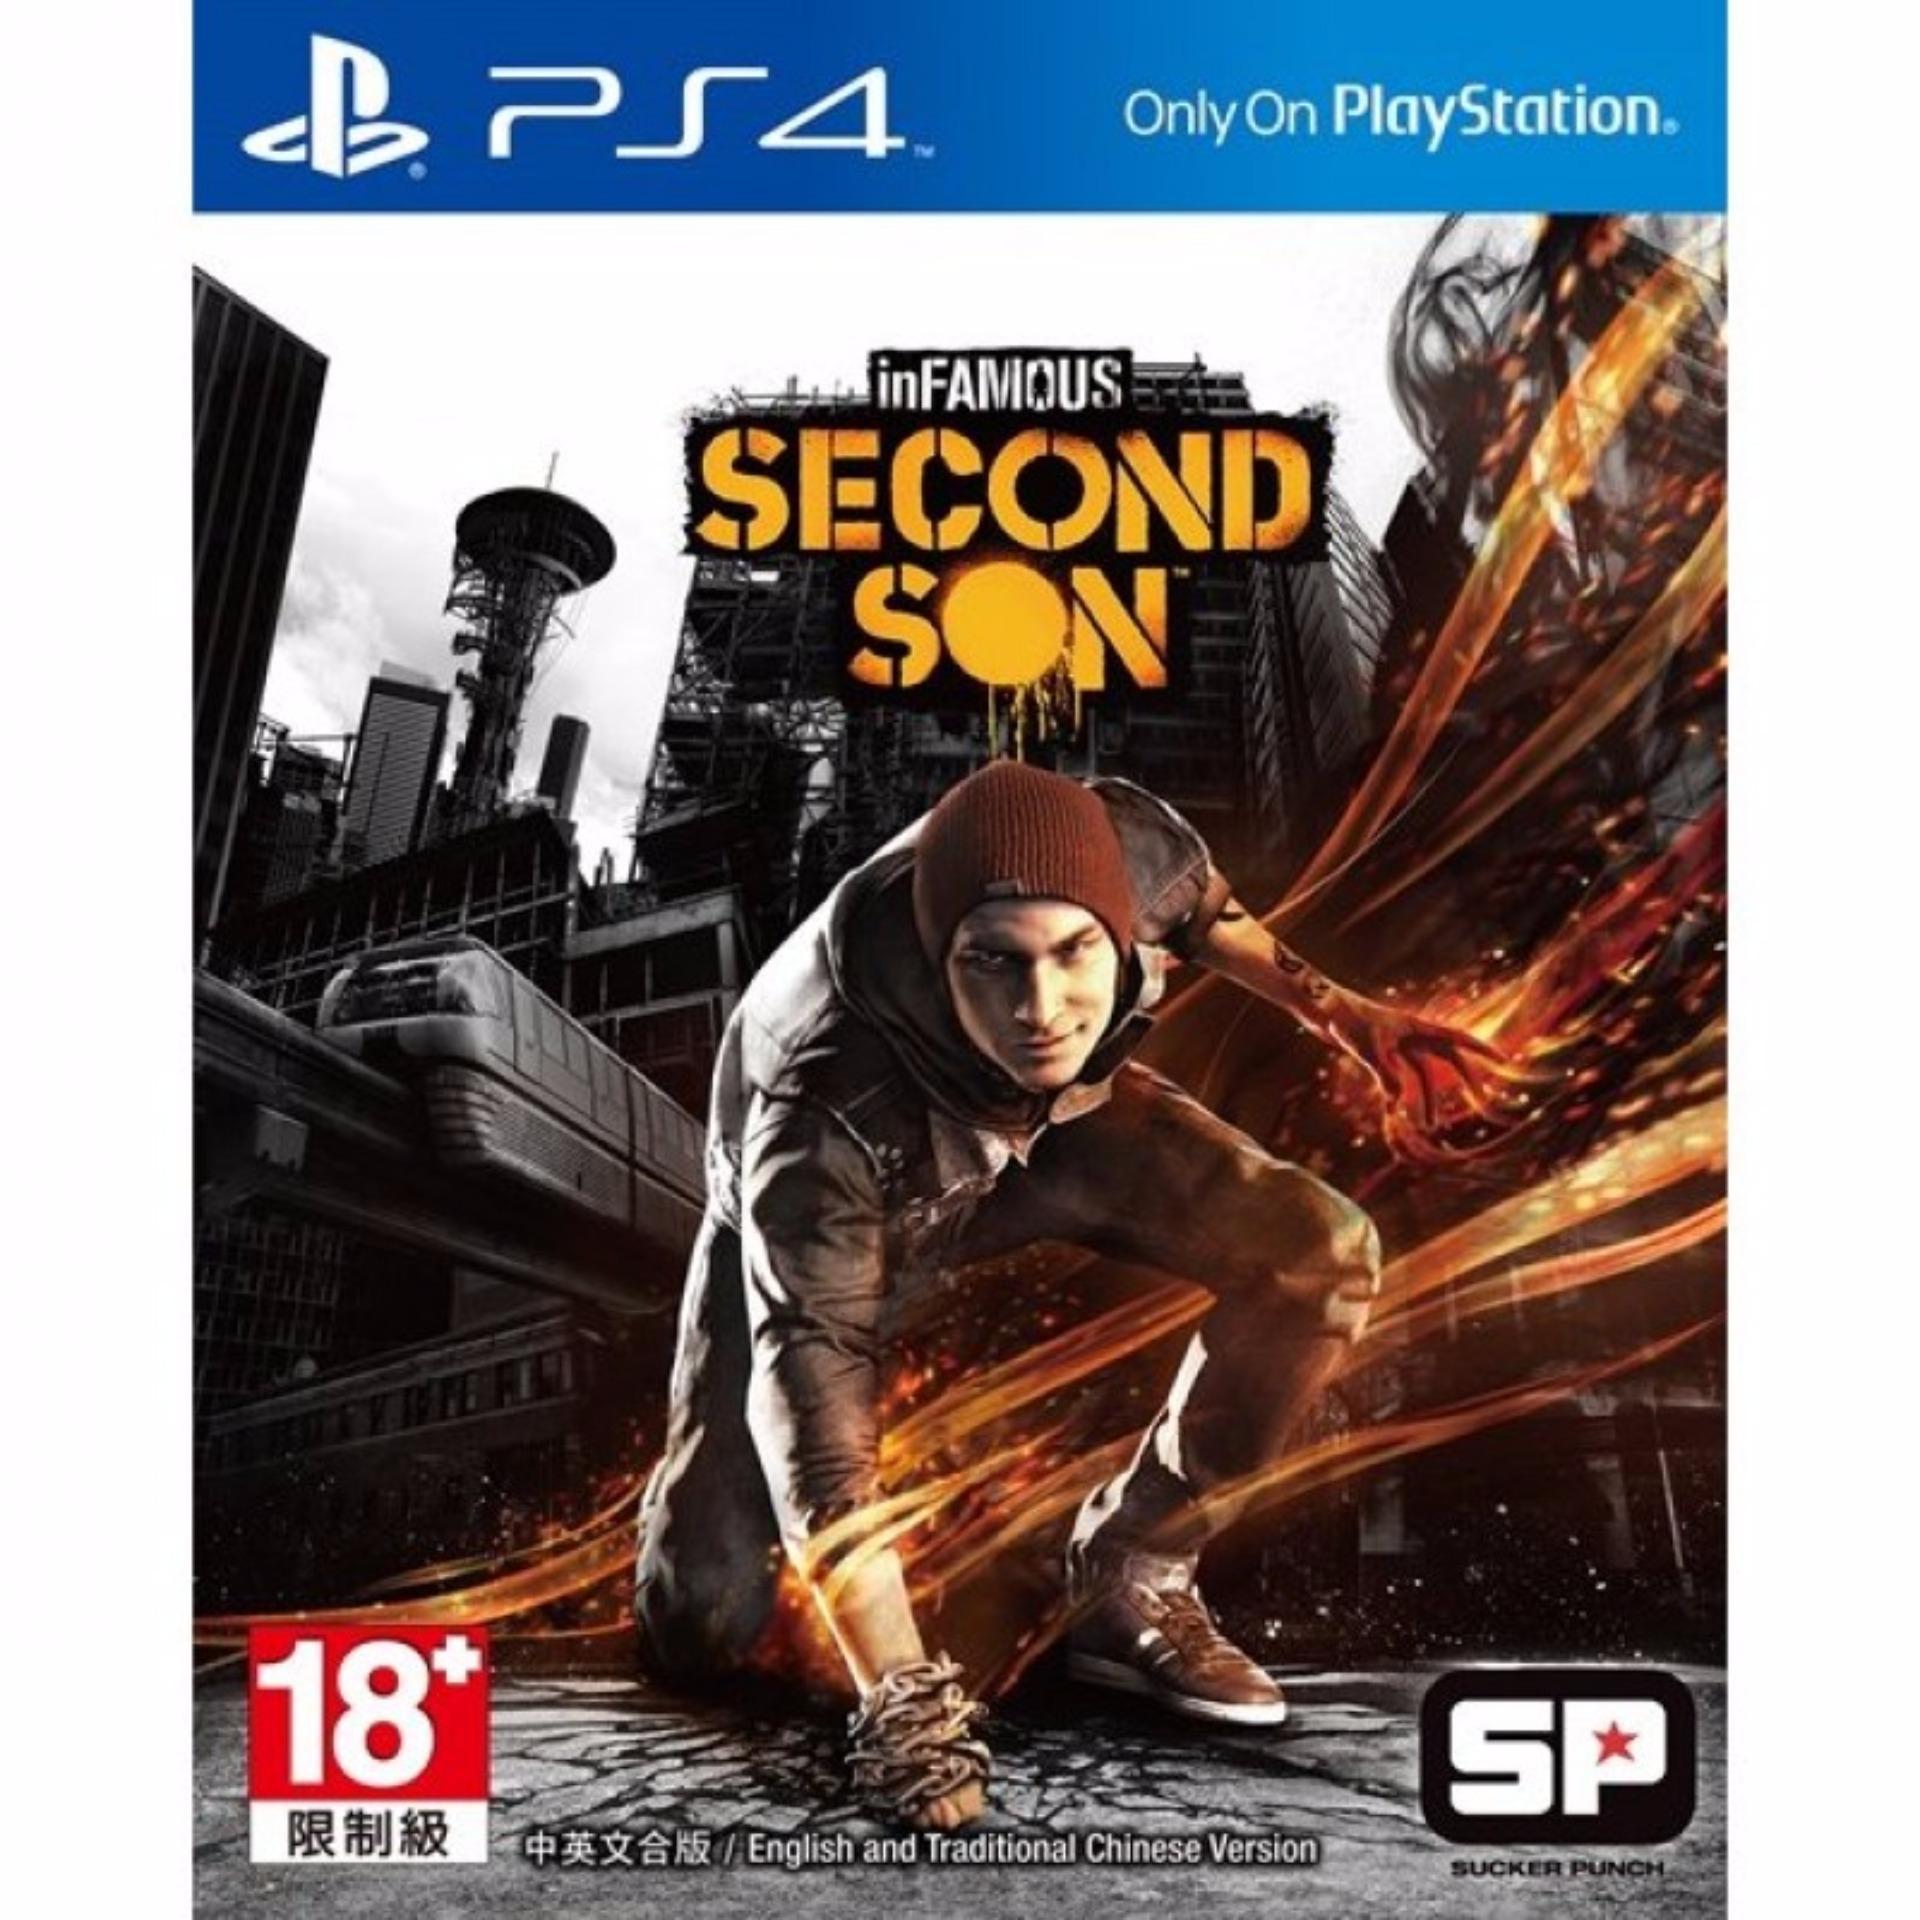 Đĩa game PS4: Infamous: Second Son